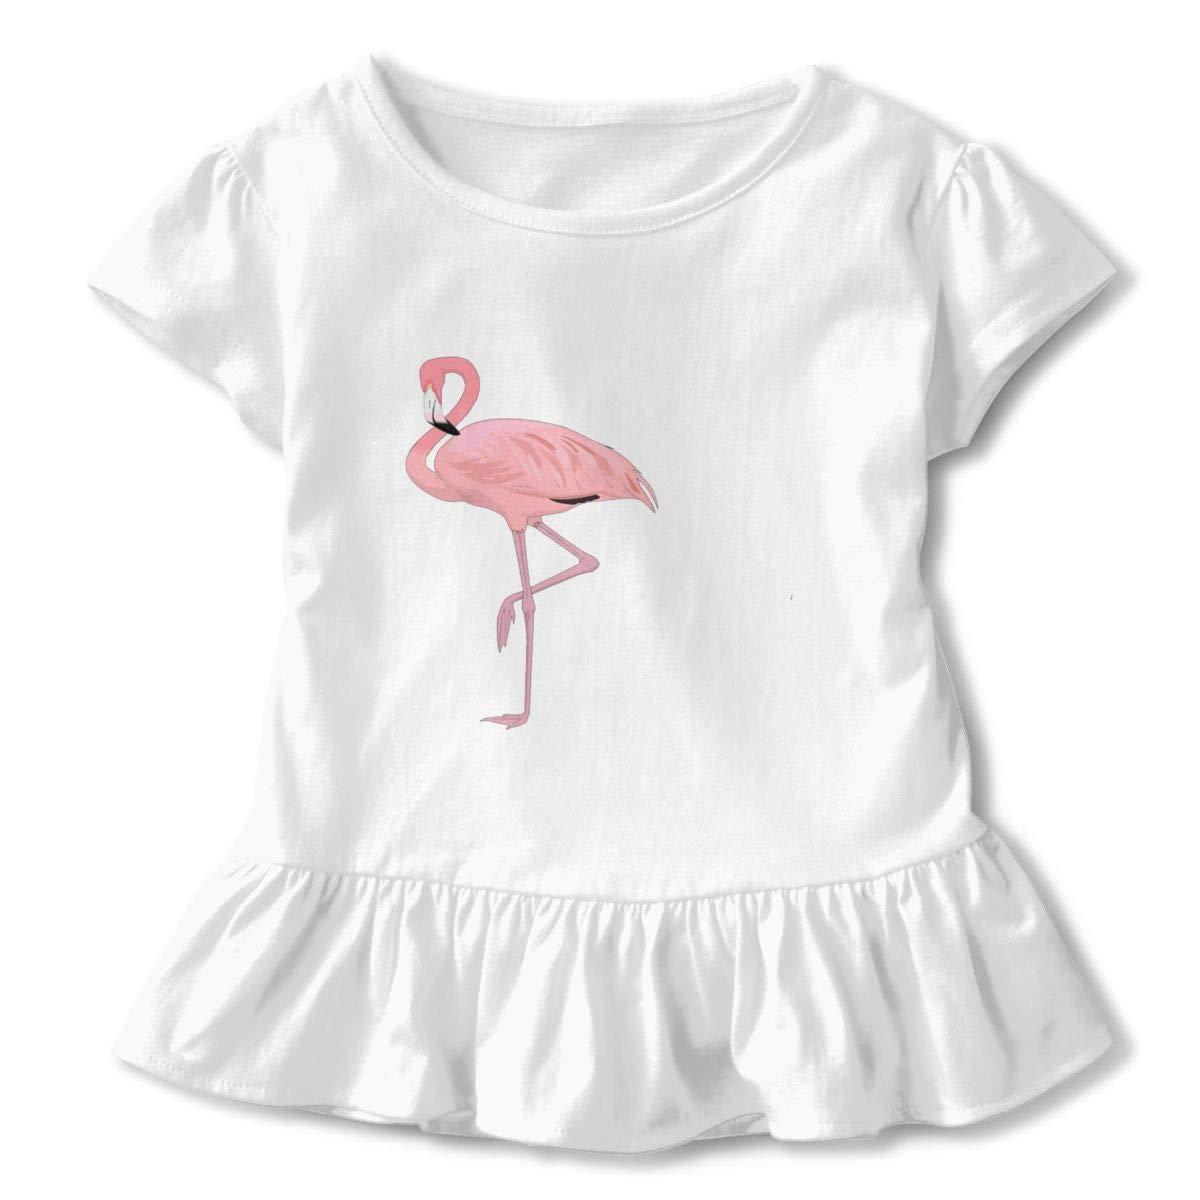 Happy-girl Ye 32377836 583-5256330 Outdoor Lover Short-Sleeve Tunic T-Shirt